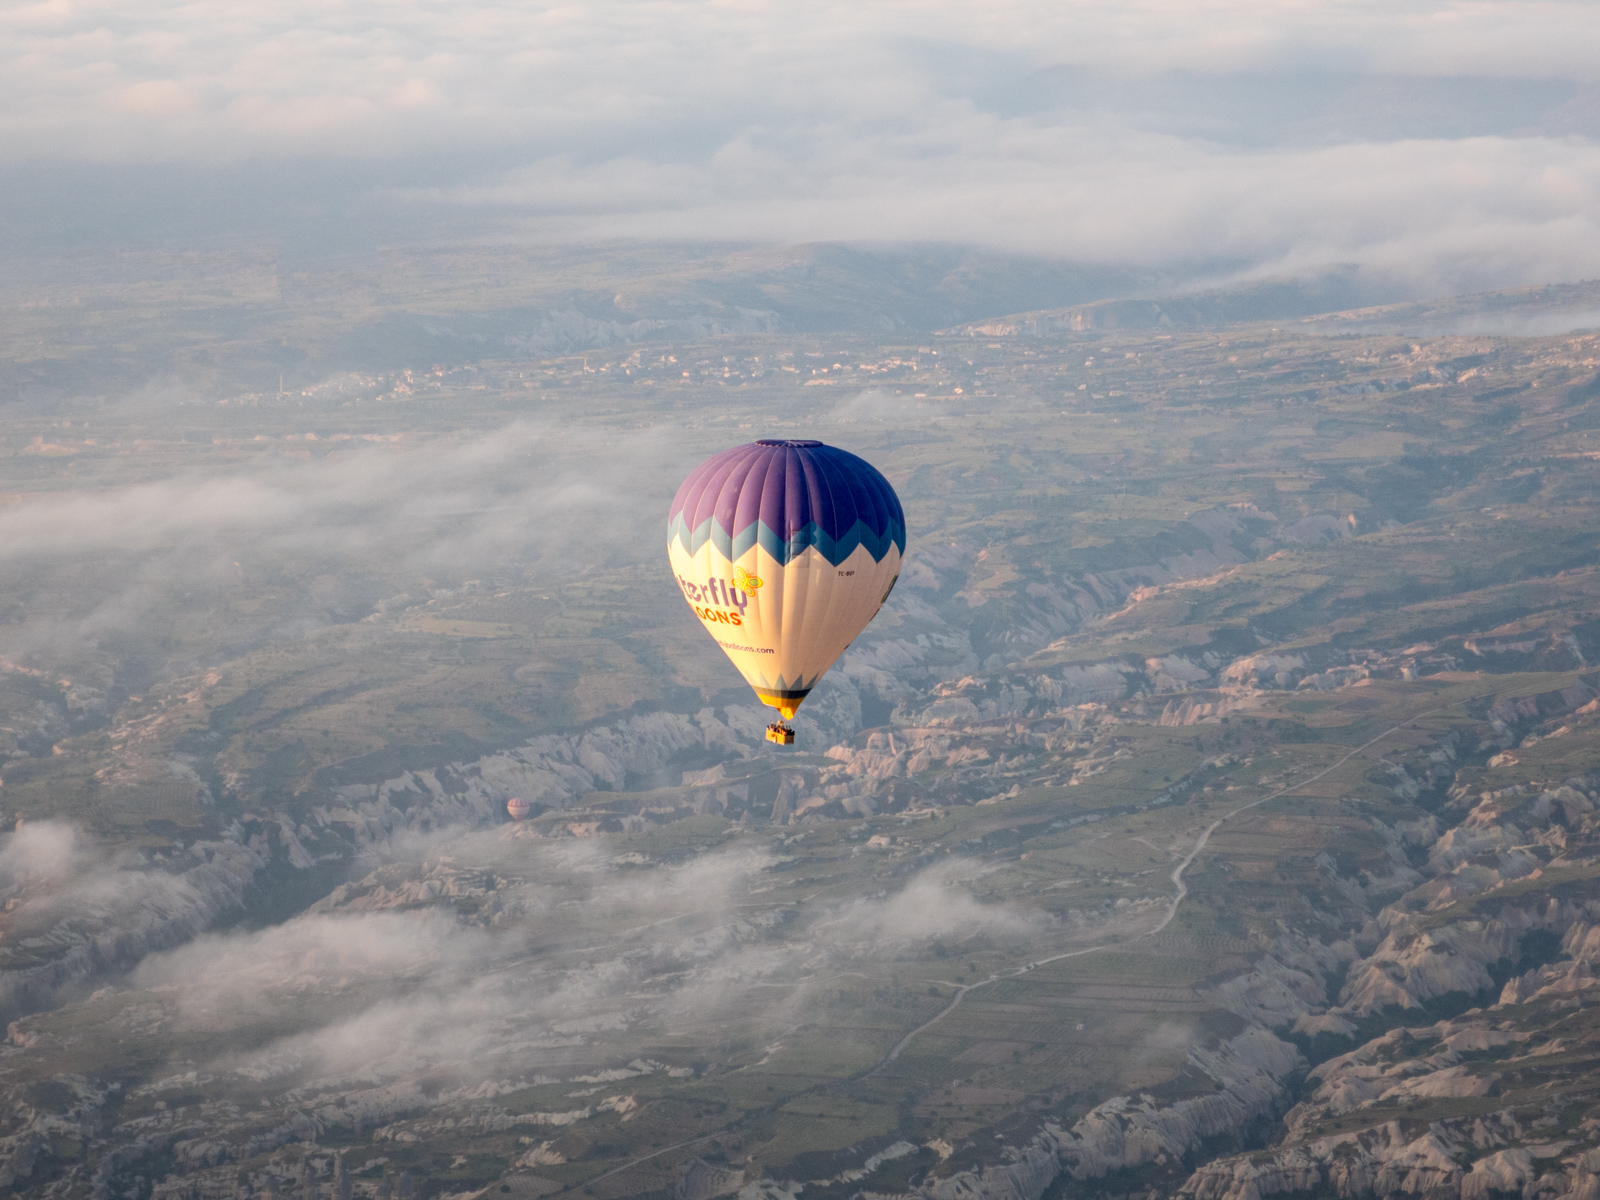 A balloon drifting back to Earth